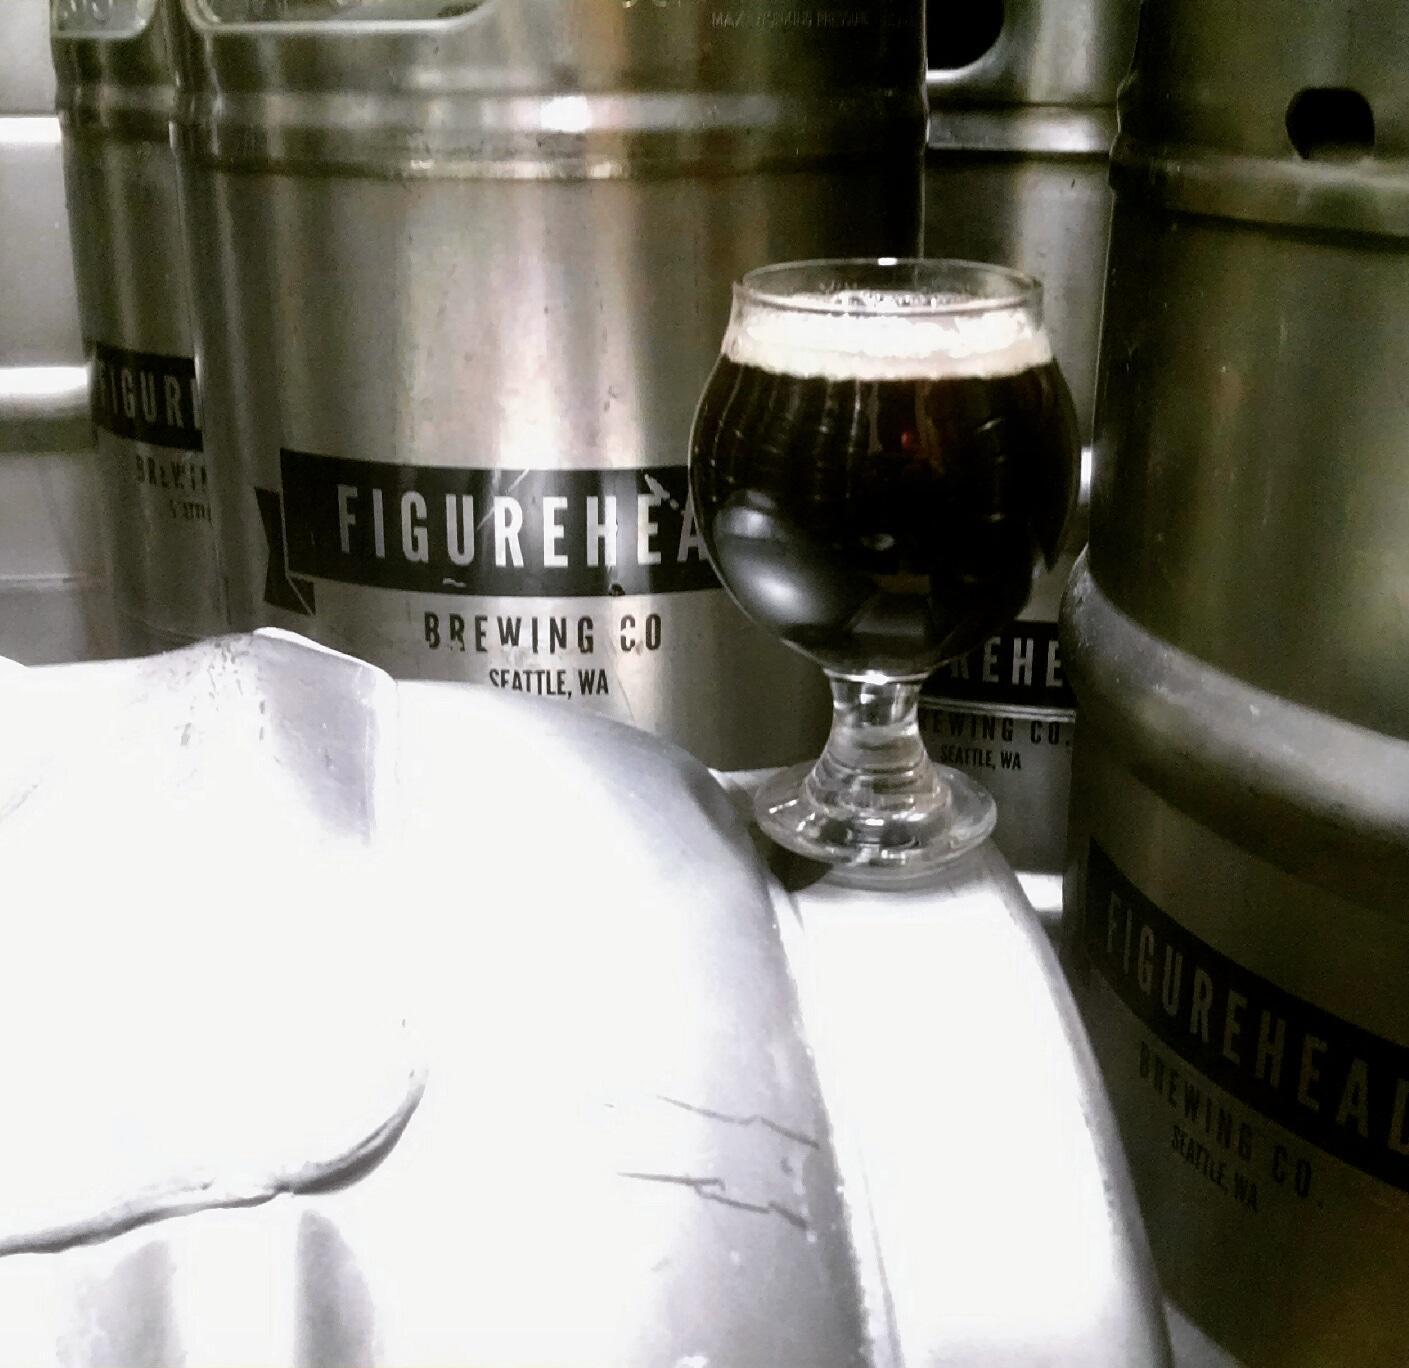 image courtesy Figurehead Brewing Company